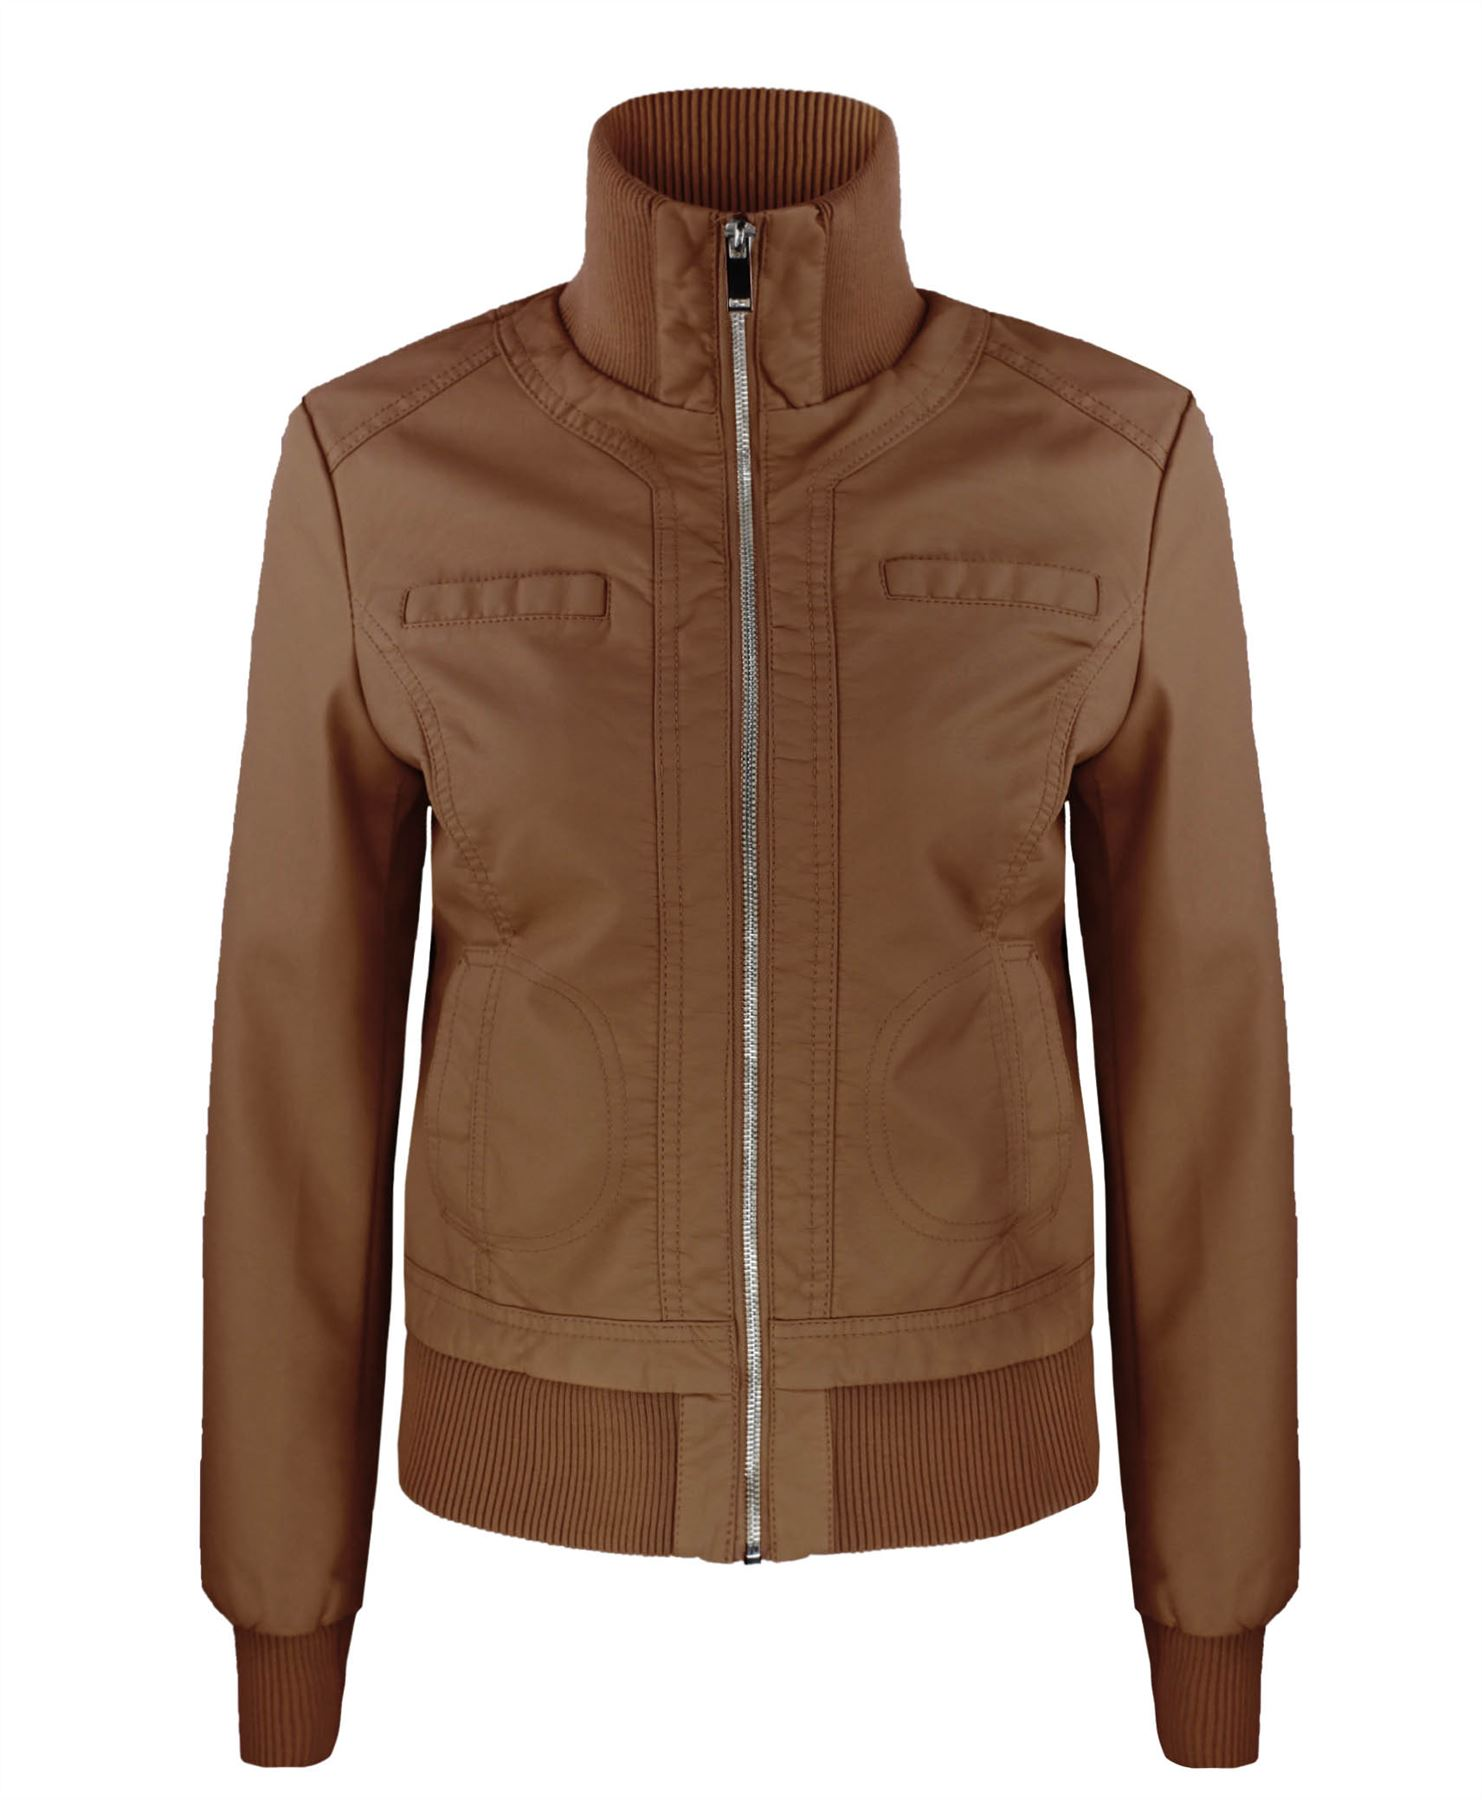 Soft leather jacket ladies